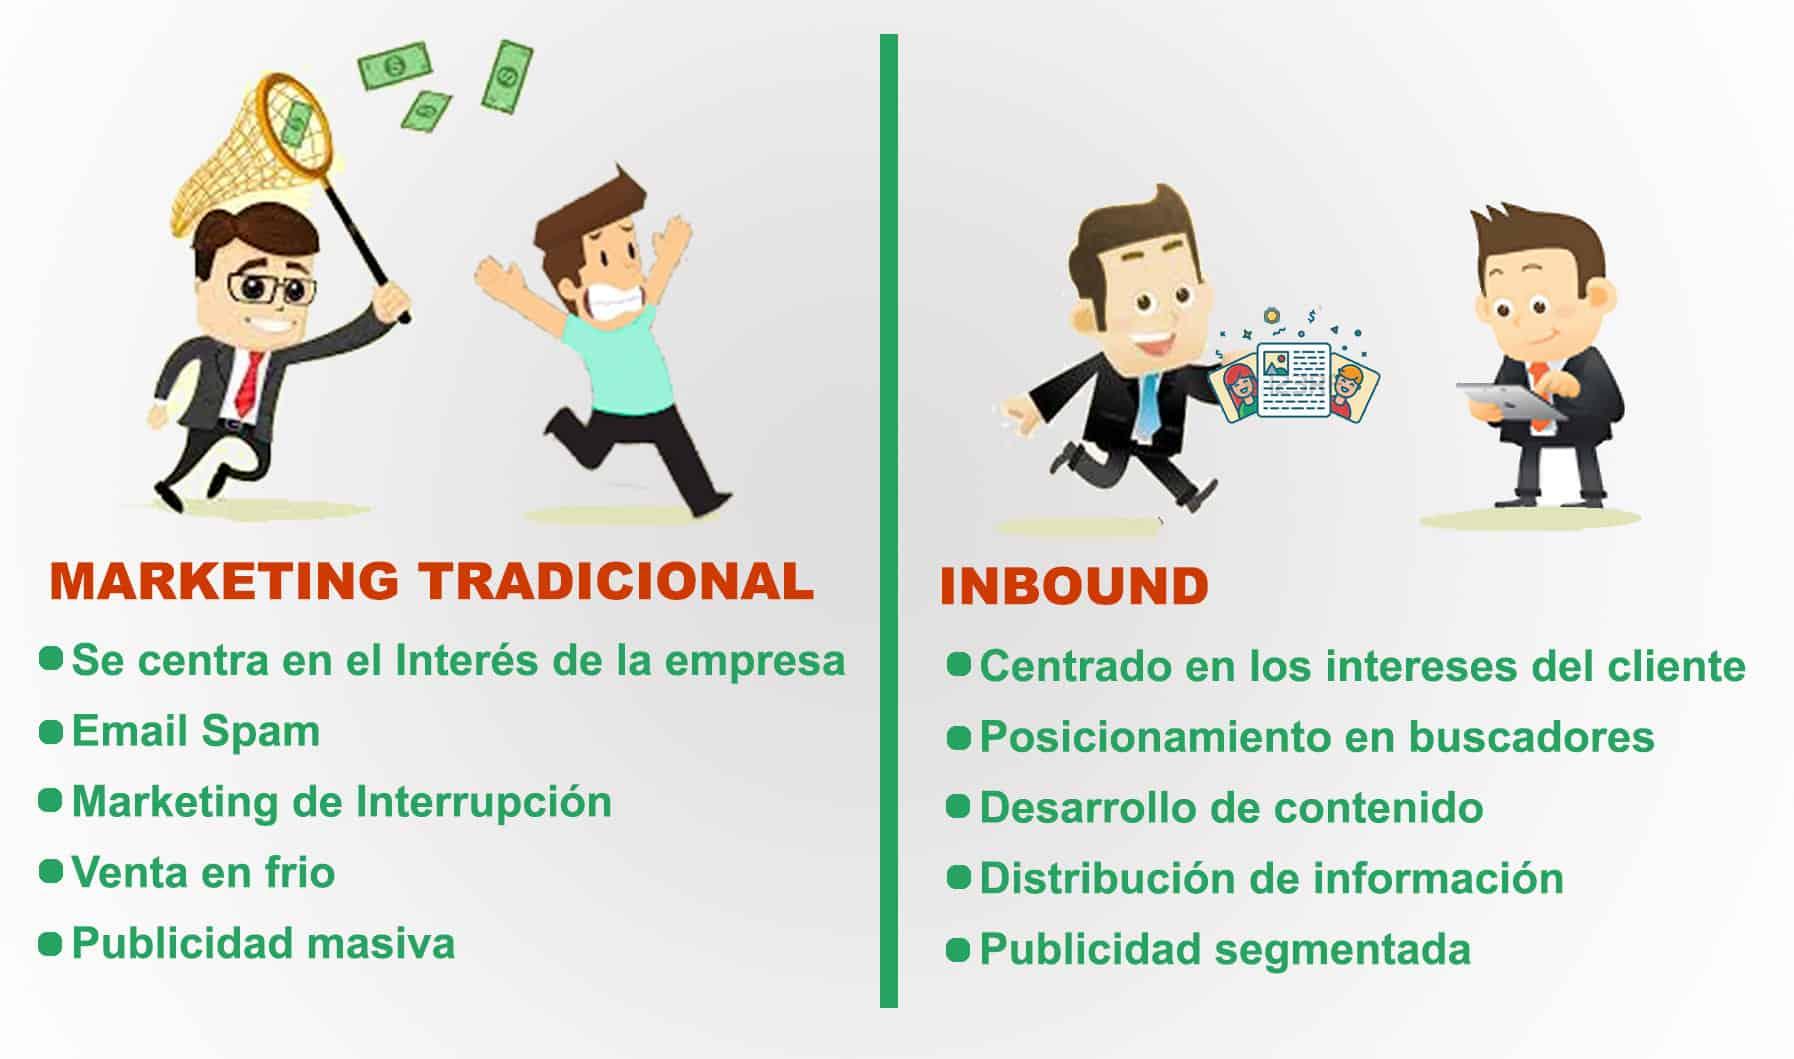 Marketing Tradicional vs Inbound